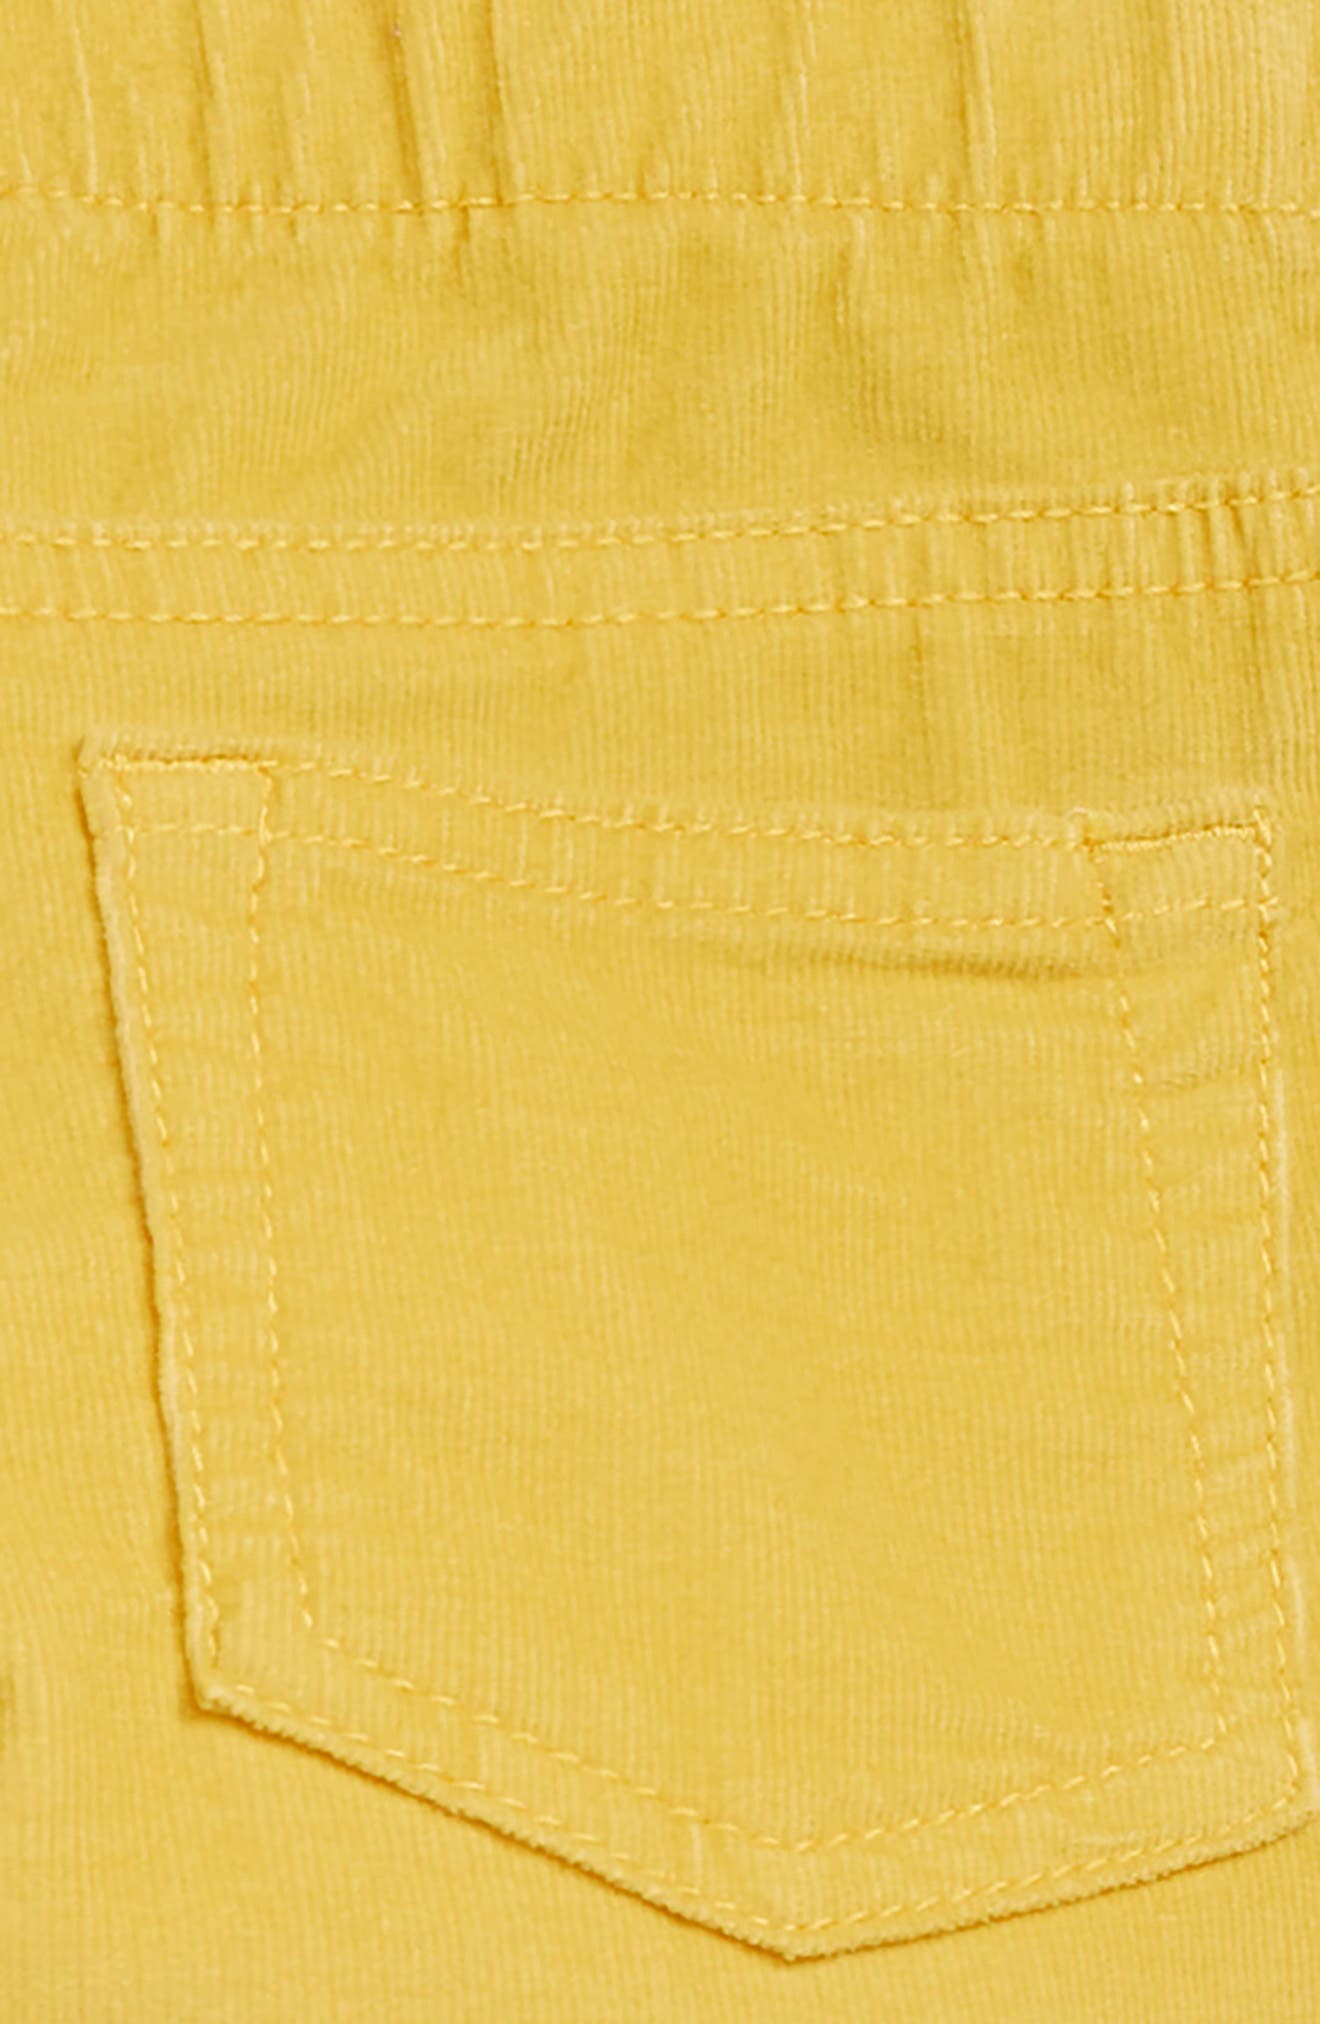 Pull-On Corduroy Pants,                             Alternate thumbnail 3, color,                             YELLOW FUN